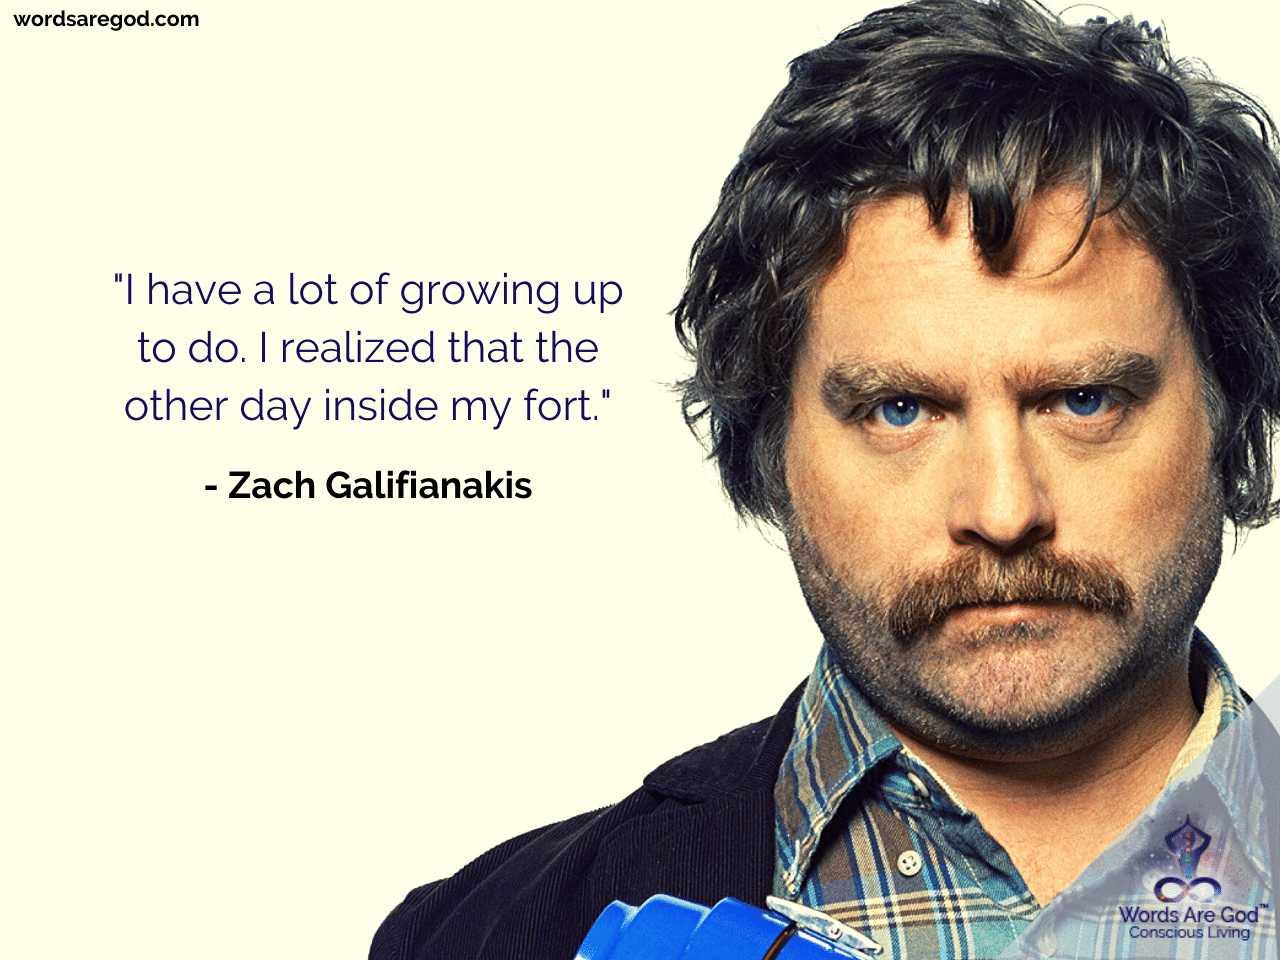 Zach Galifianakis Best Quote